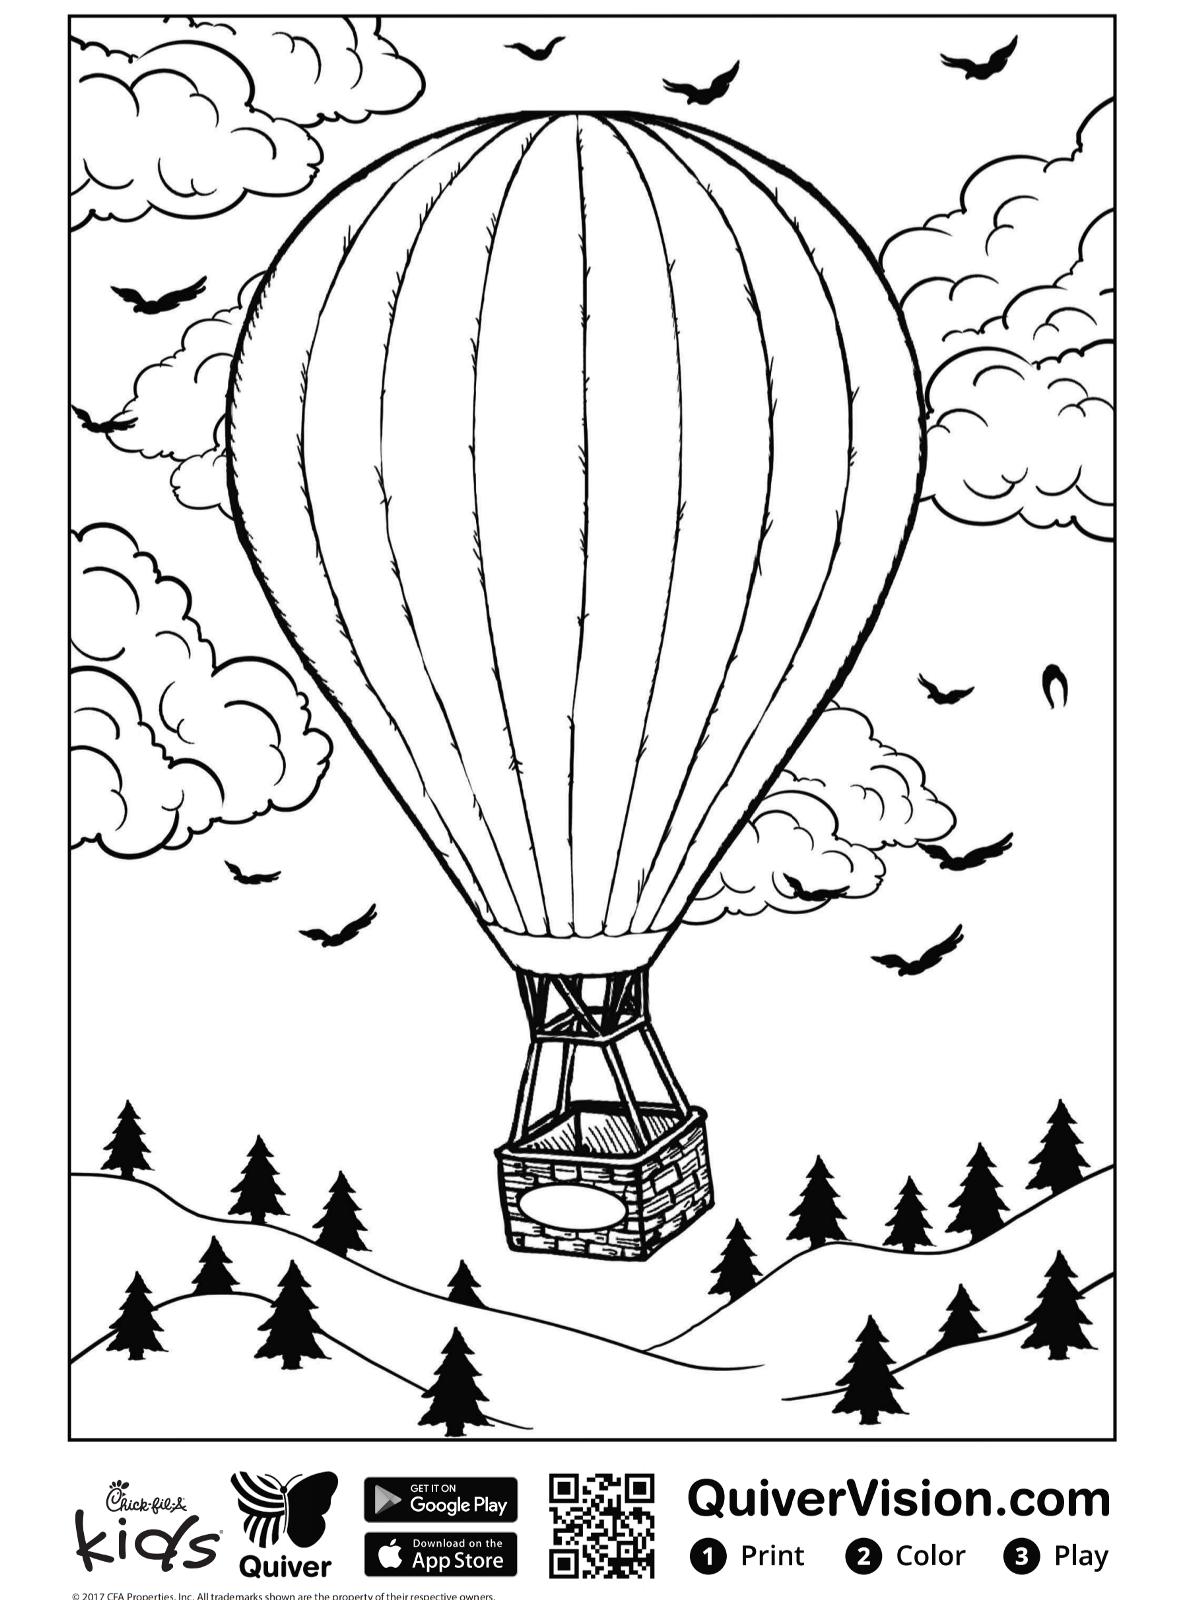 kidsnfunde  malvorlage quiver luftballon